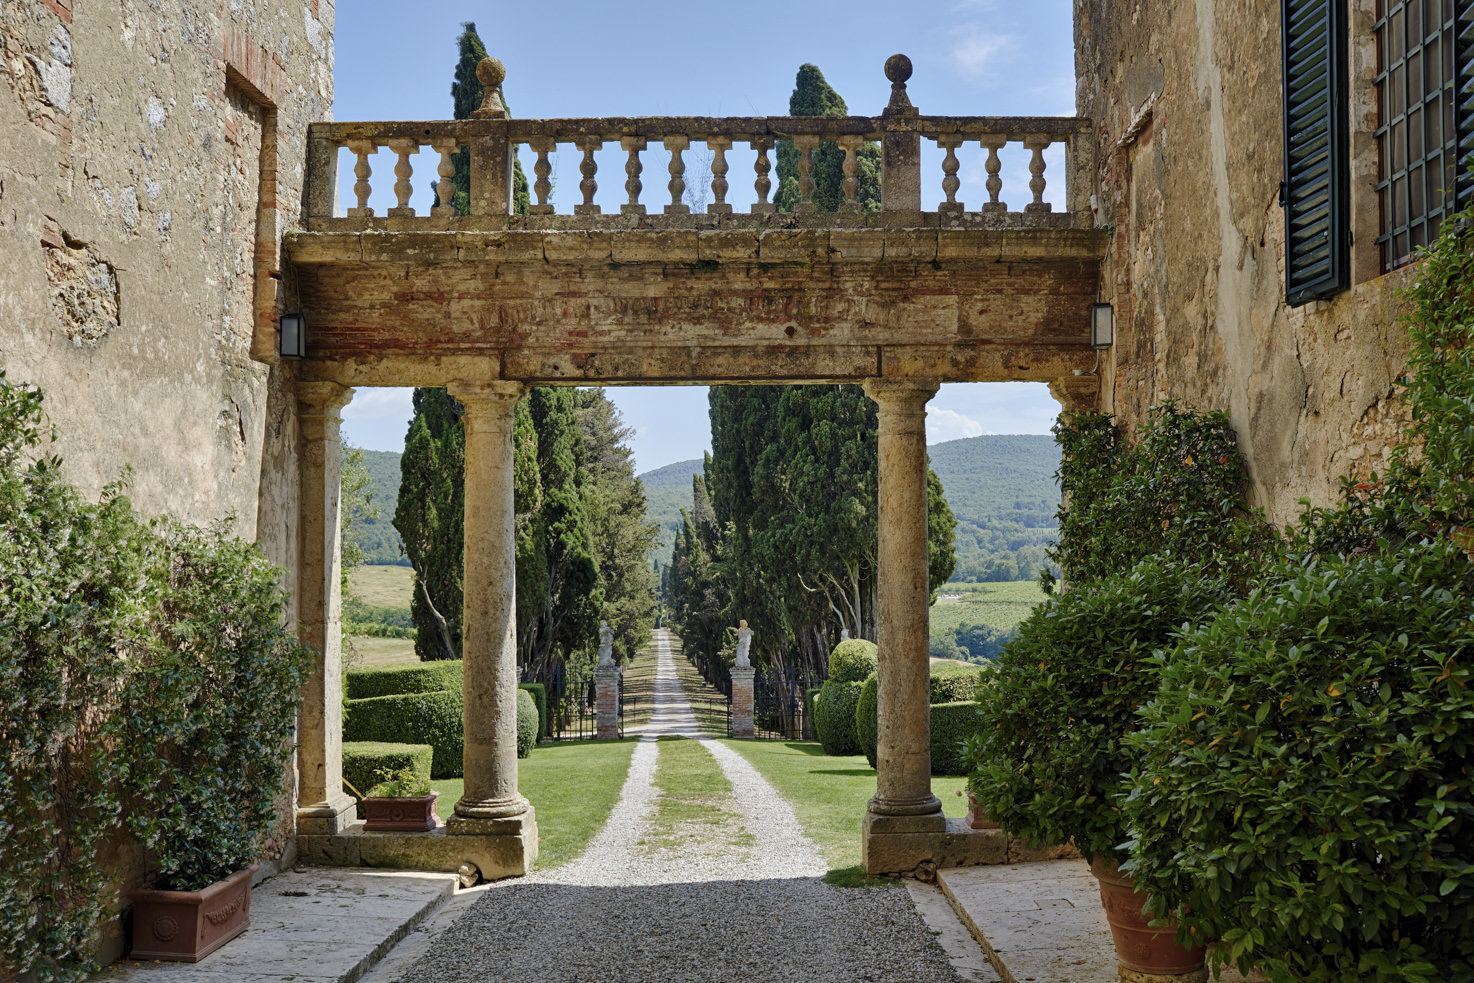 Façade of Borgo Stomennano, Siena